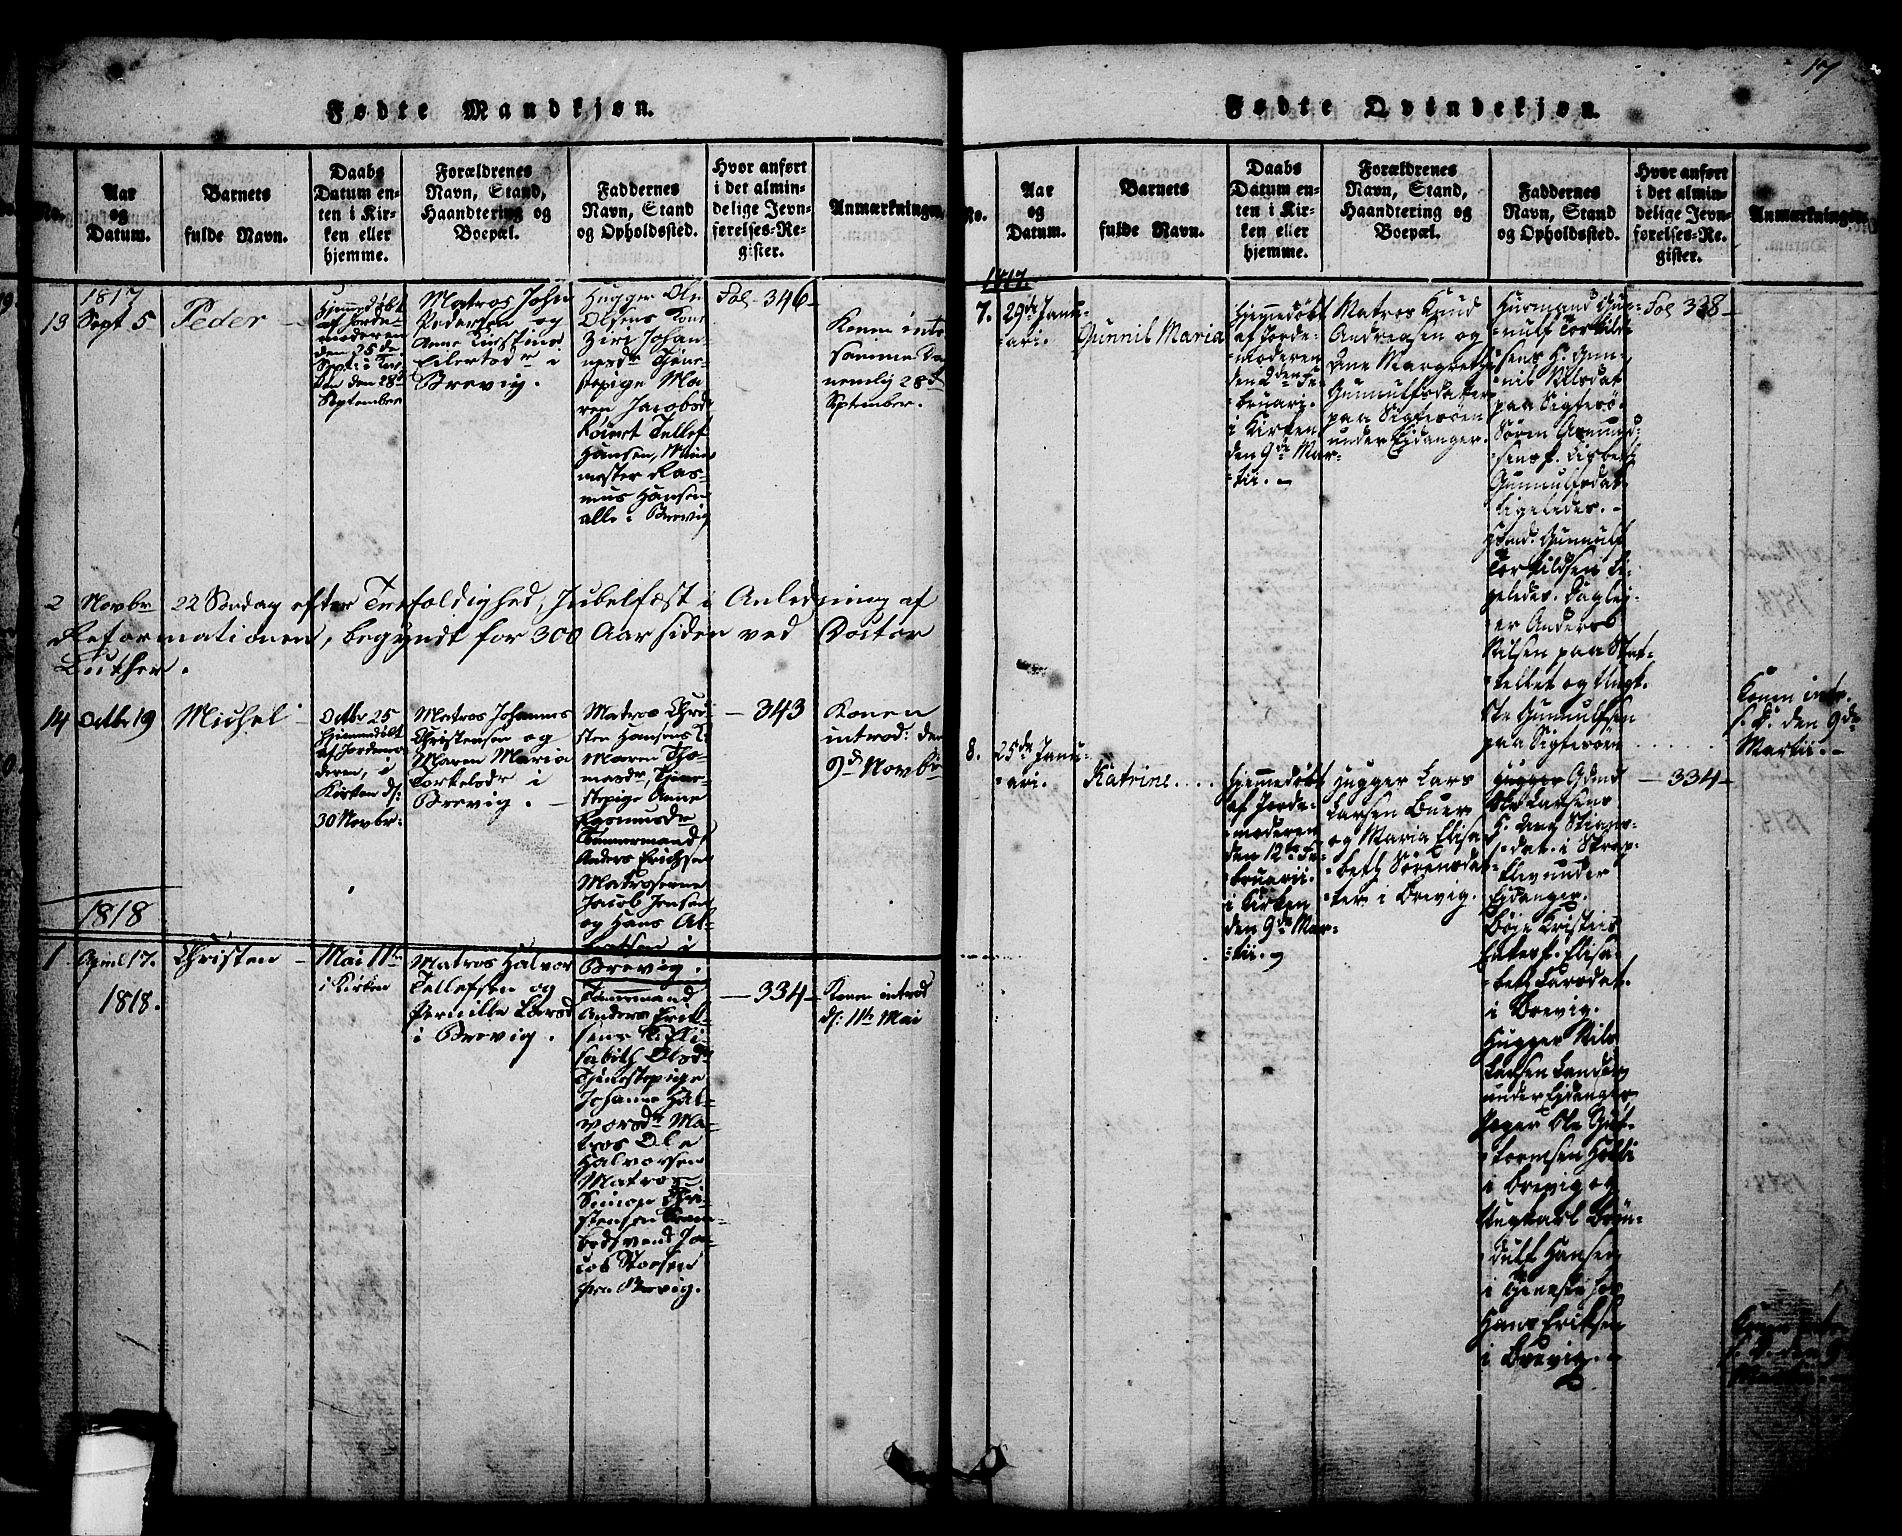 SAKO, Brevik kirkebøker, G/Ga/L0001: Klokkerbok nr. 1, 1814-1845, s. 17